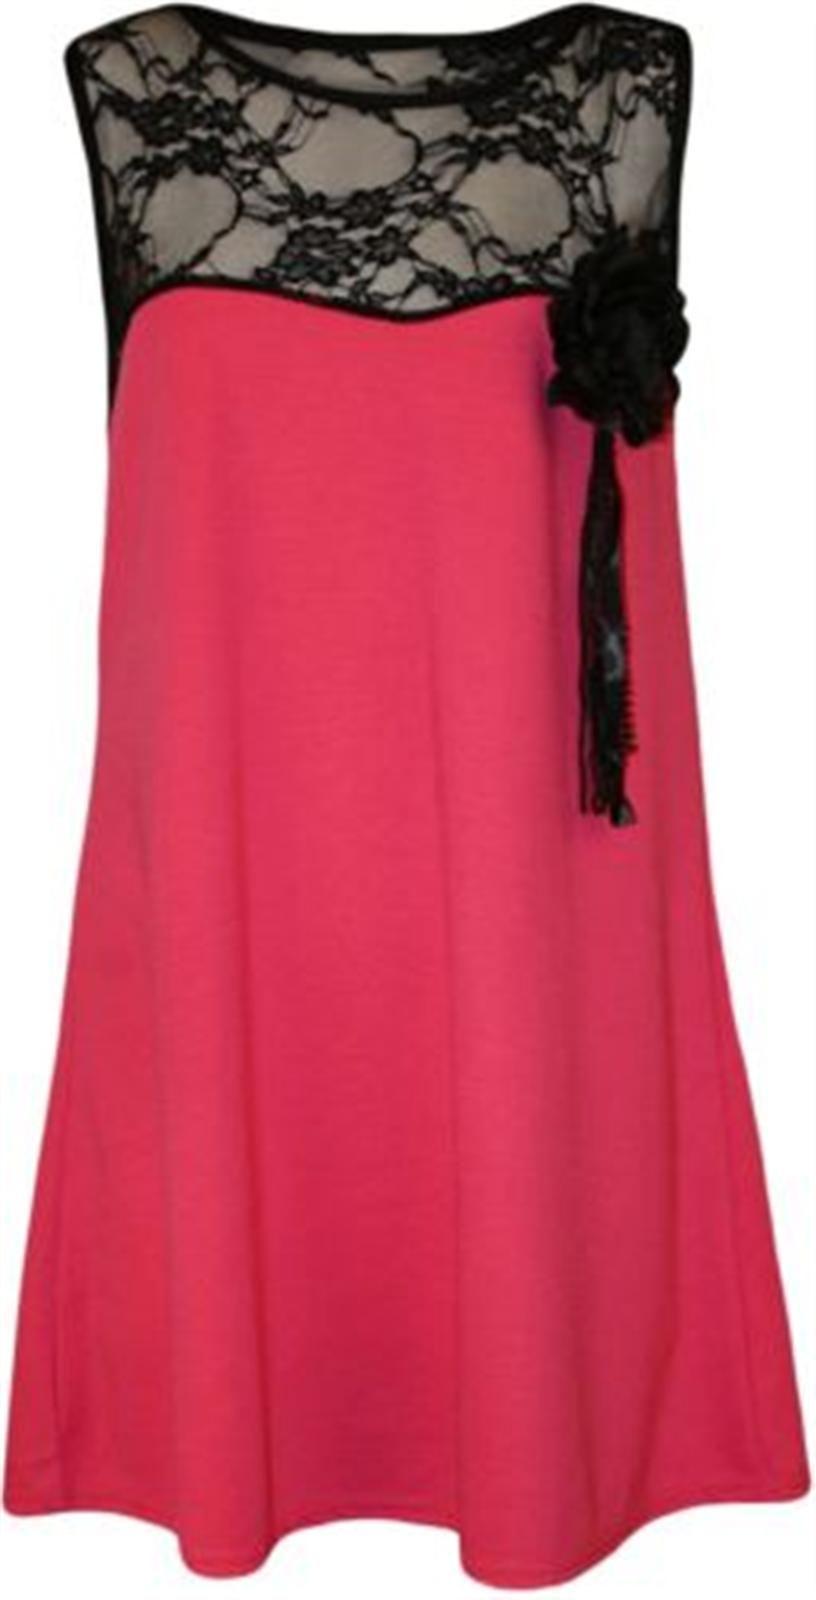 Plus size lace dresses for women pictures